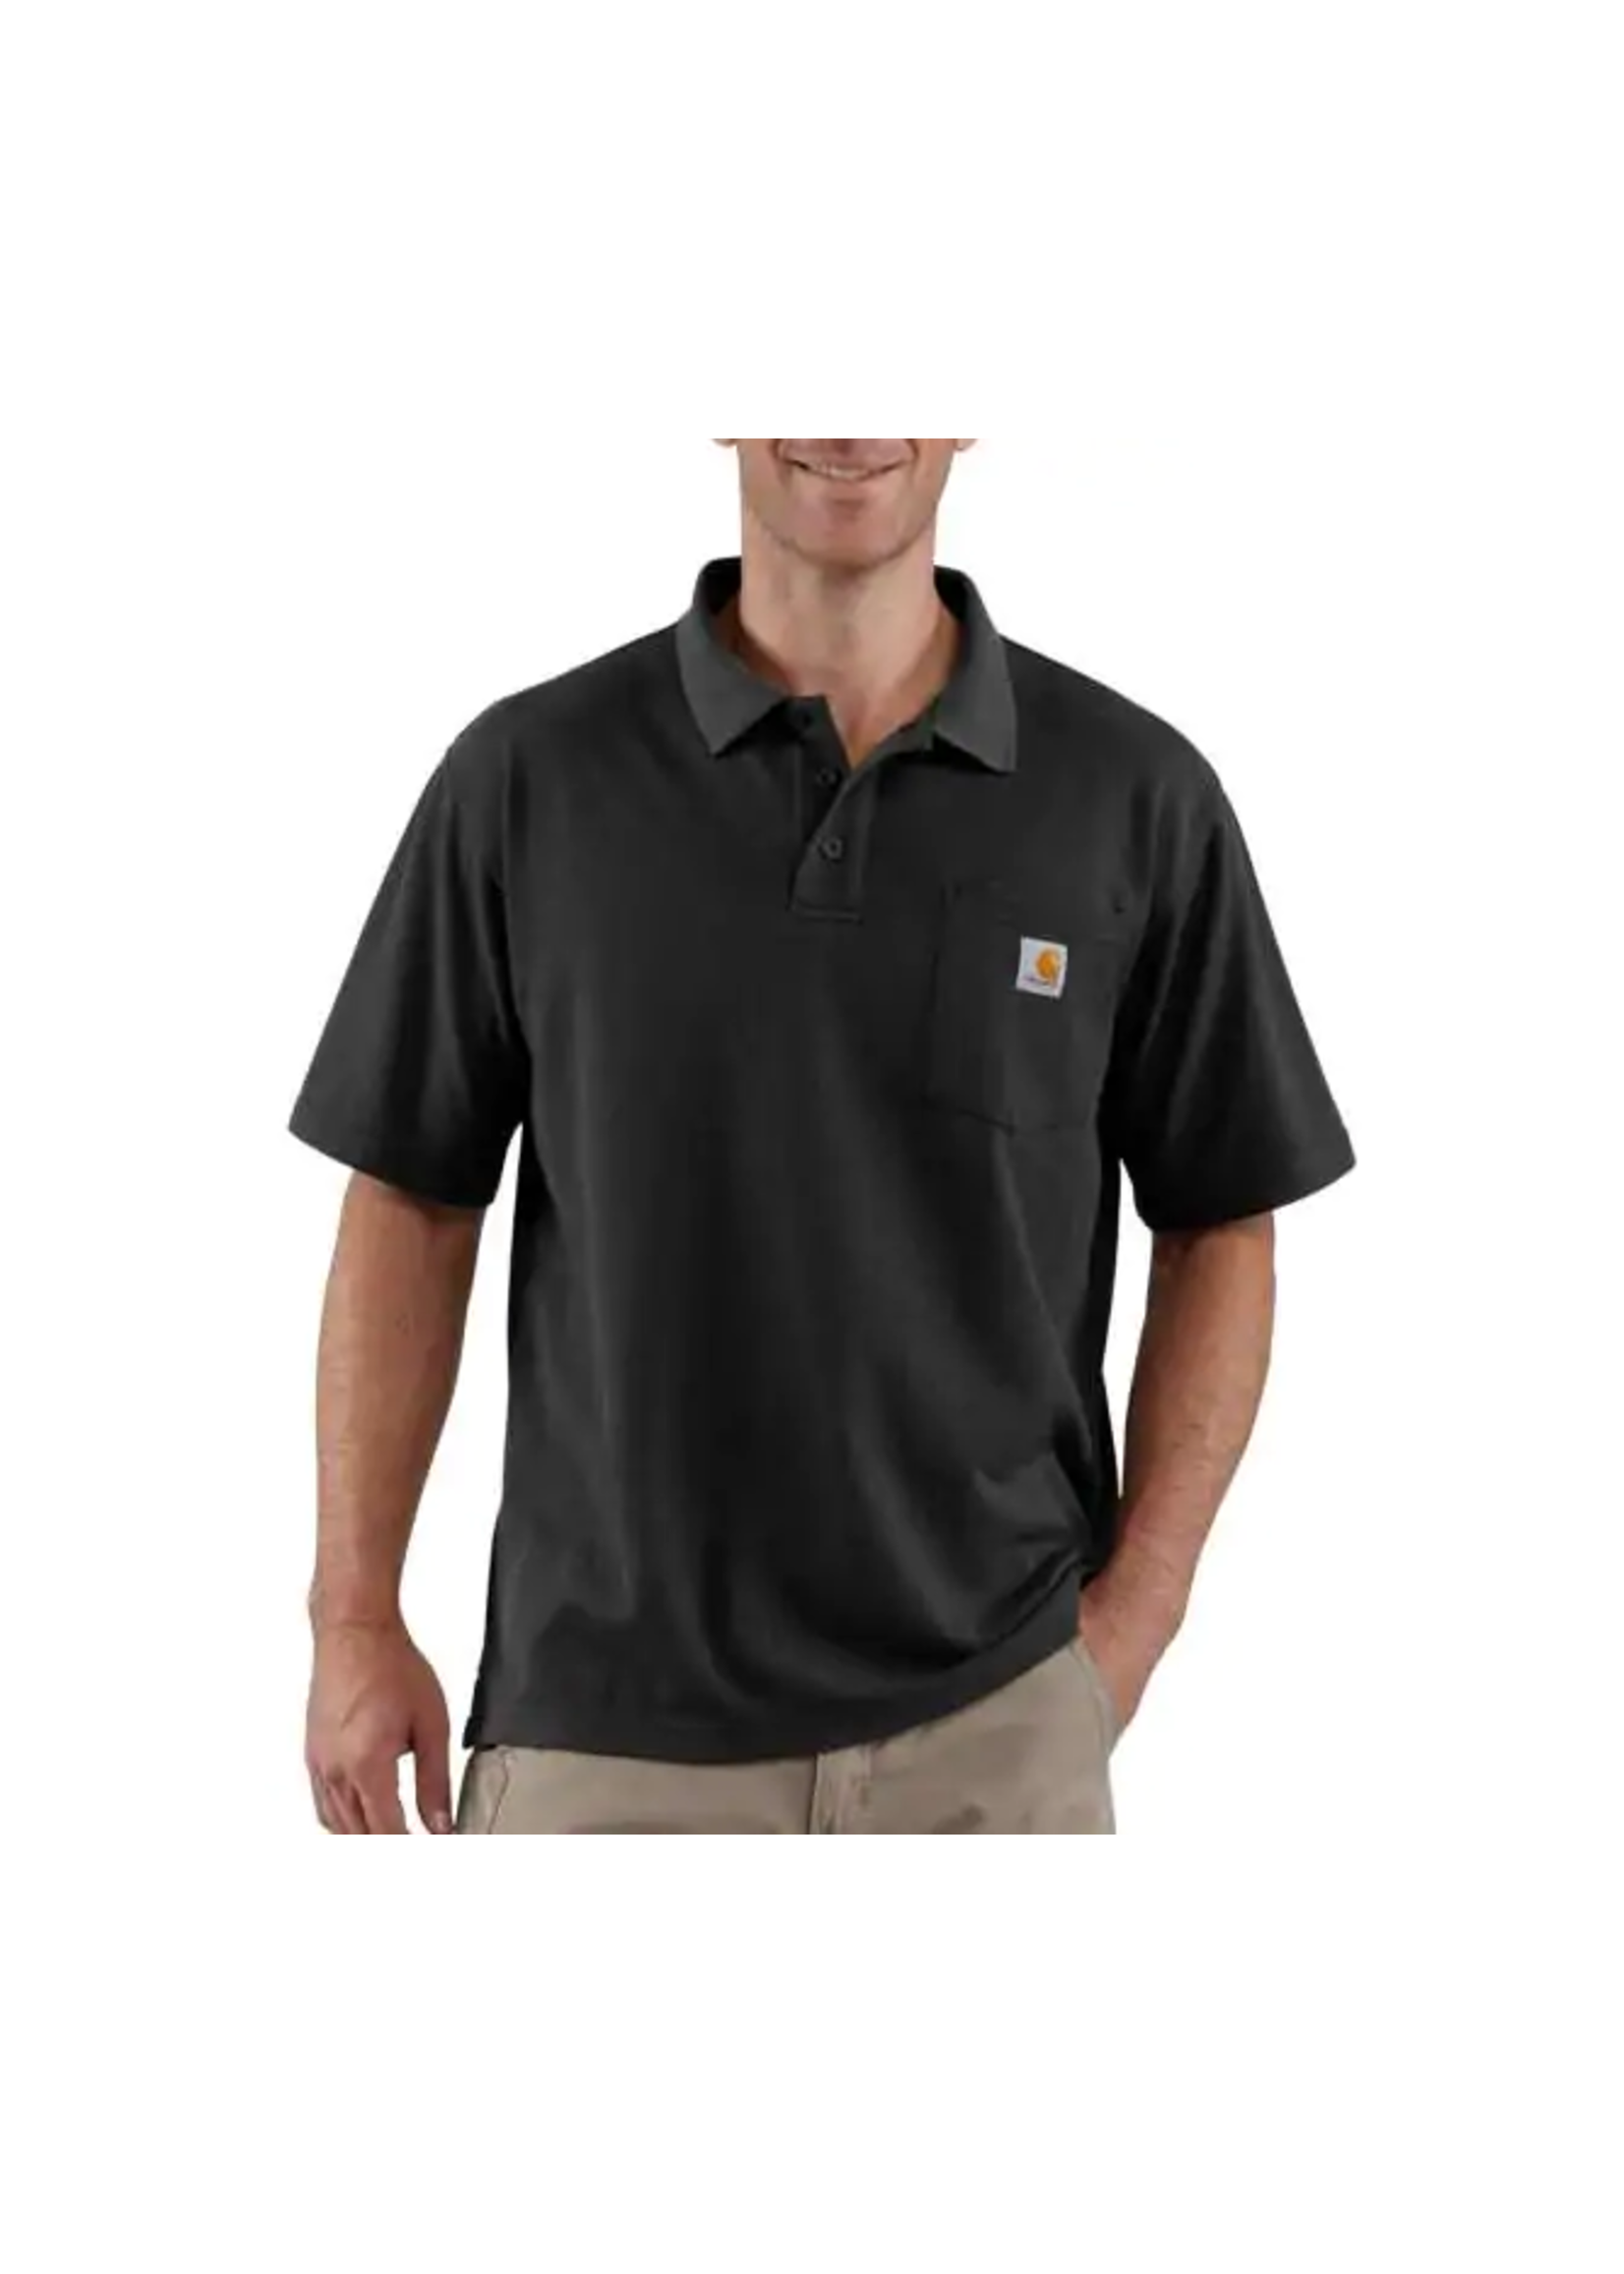 Carhartt Contractor's Work Pocket® Polo